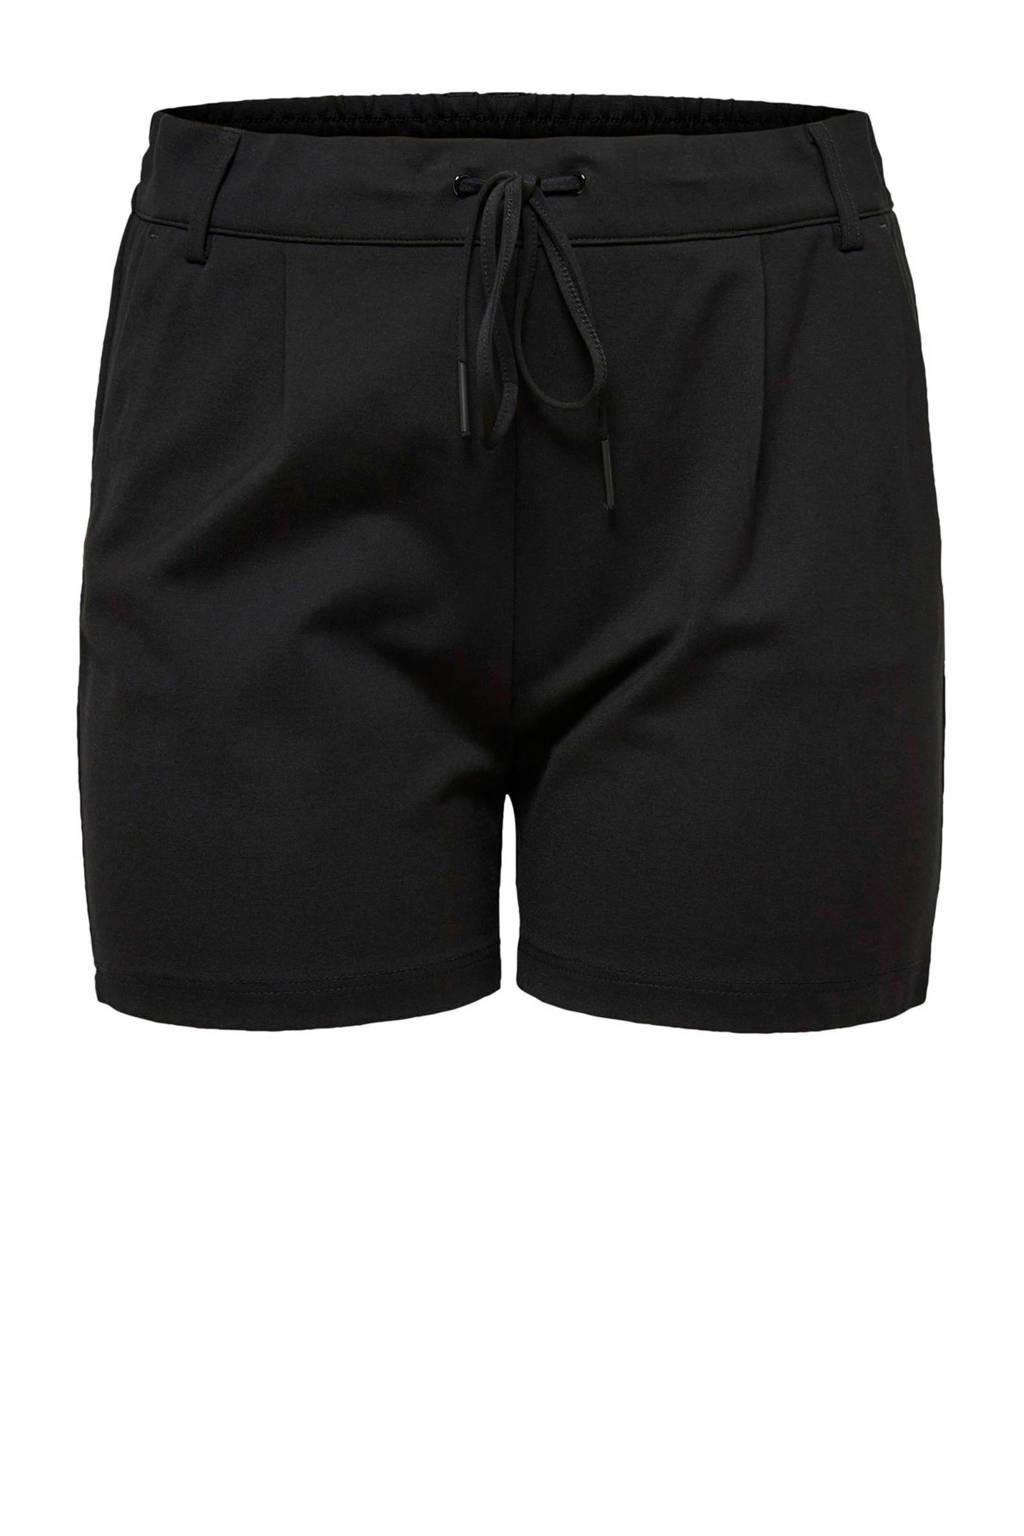 ONLY carmakoma korte broek zwart, Zwart